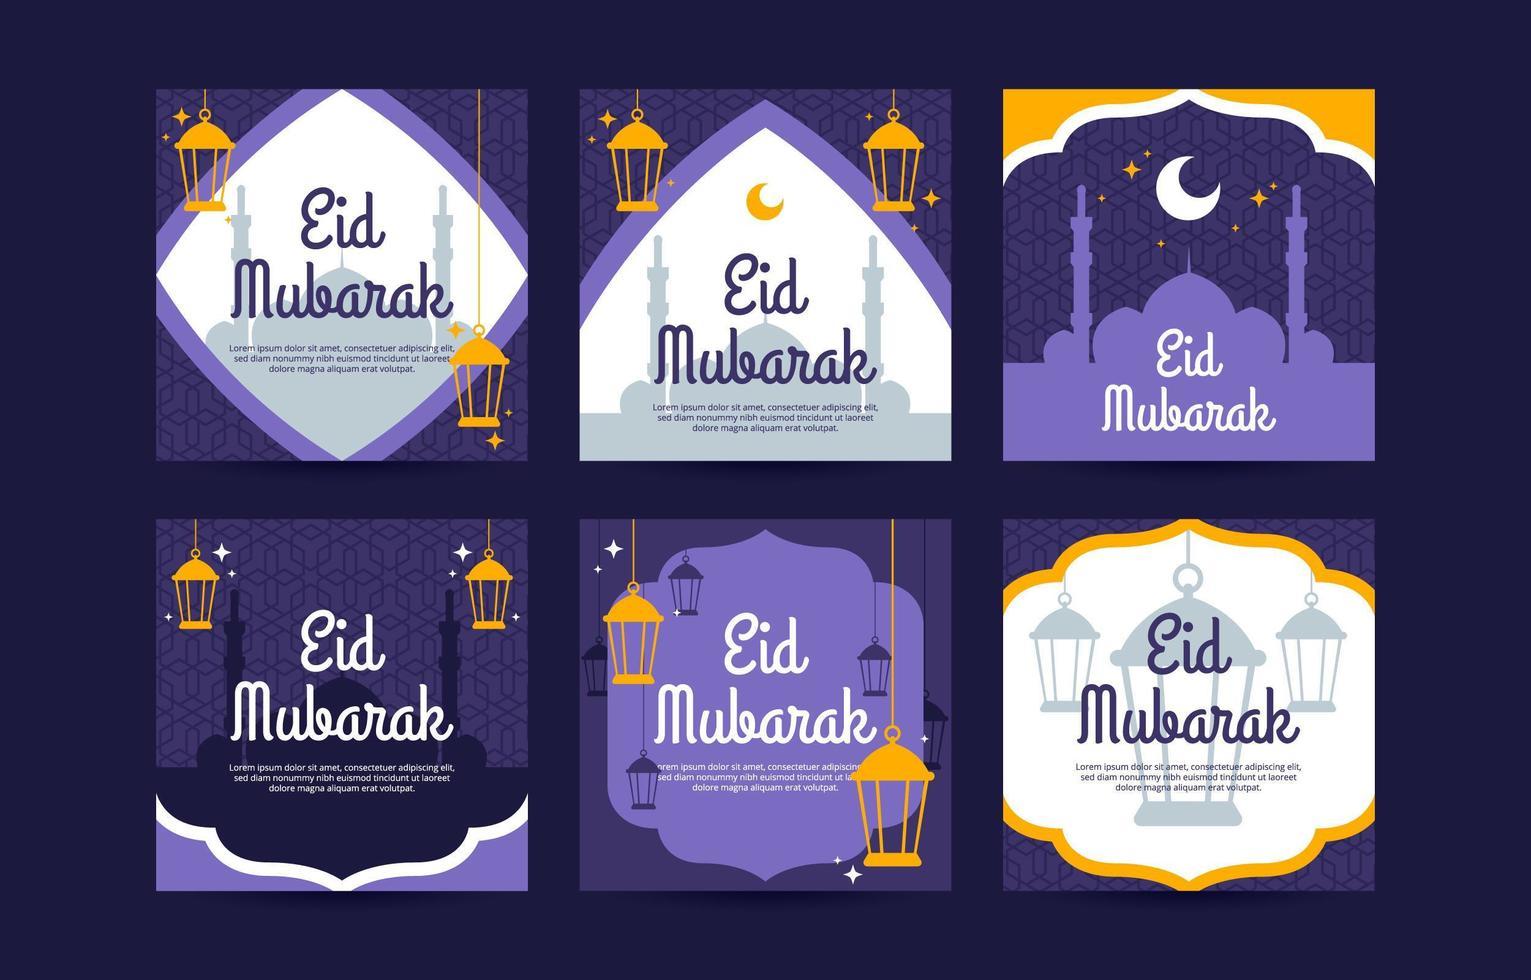 Eid Mubarak Social Media Post Template vector